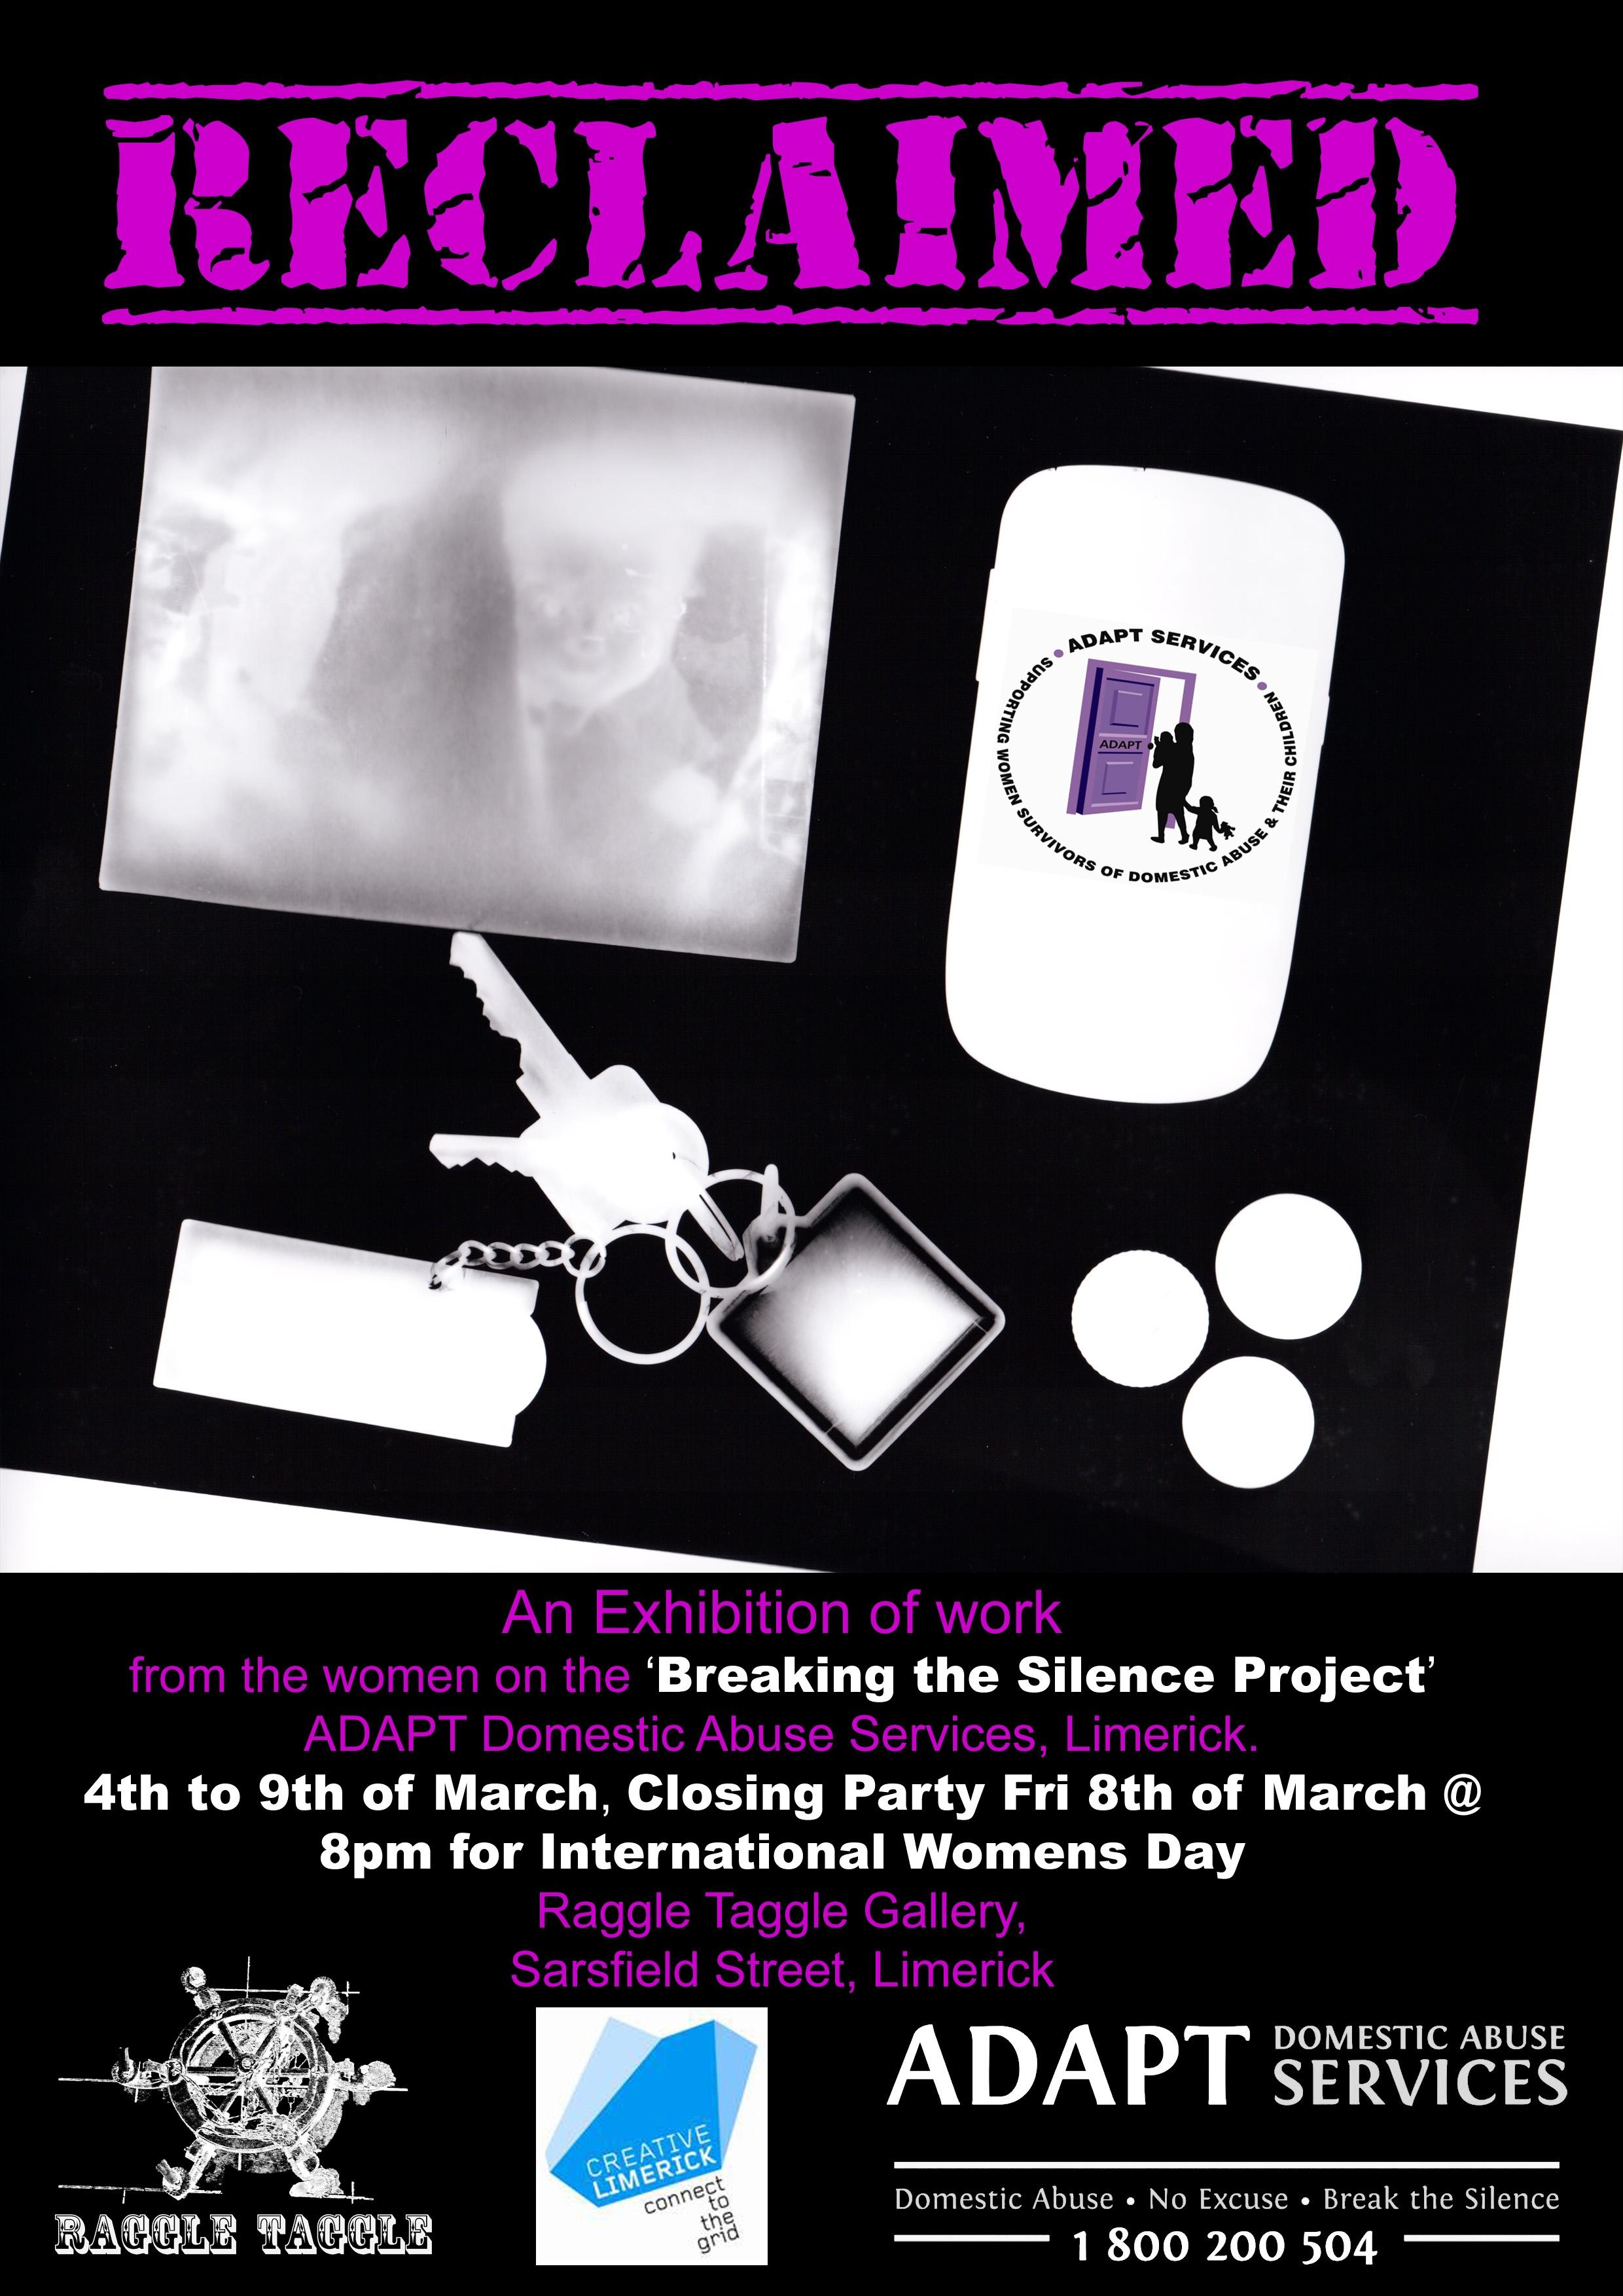 Exhibition to Mark International Women's Day